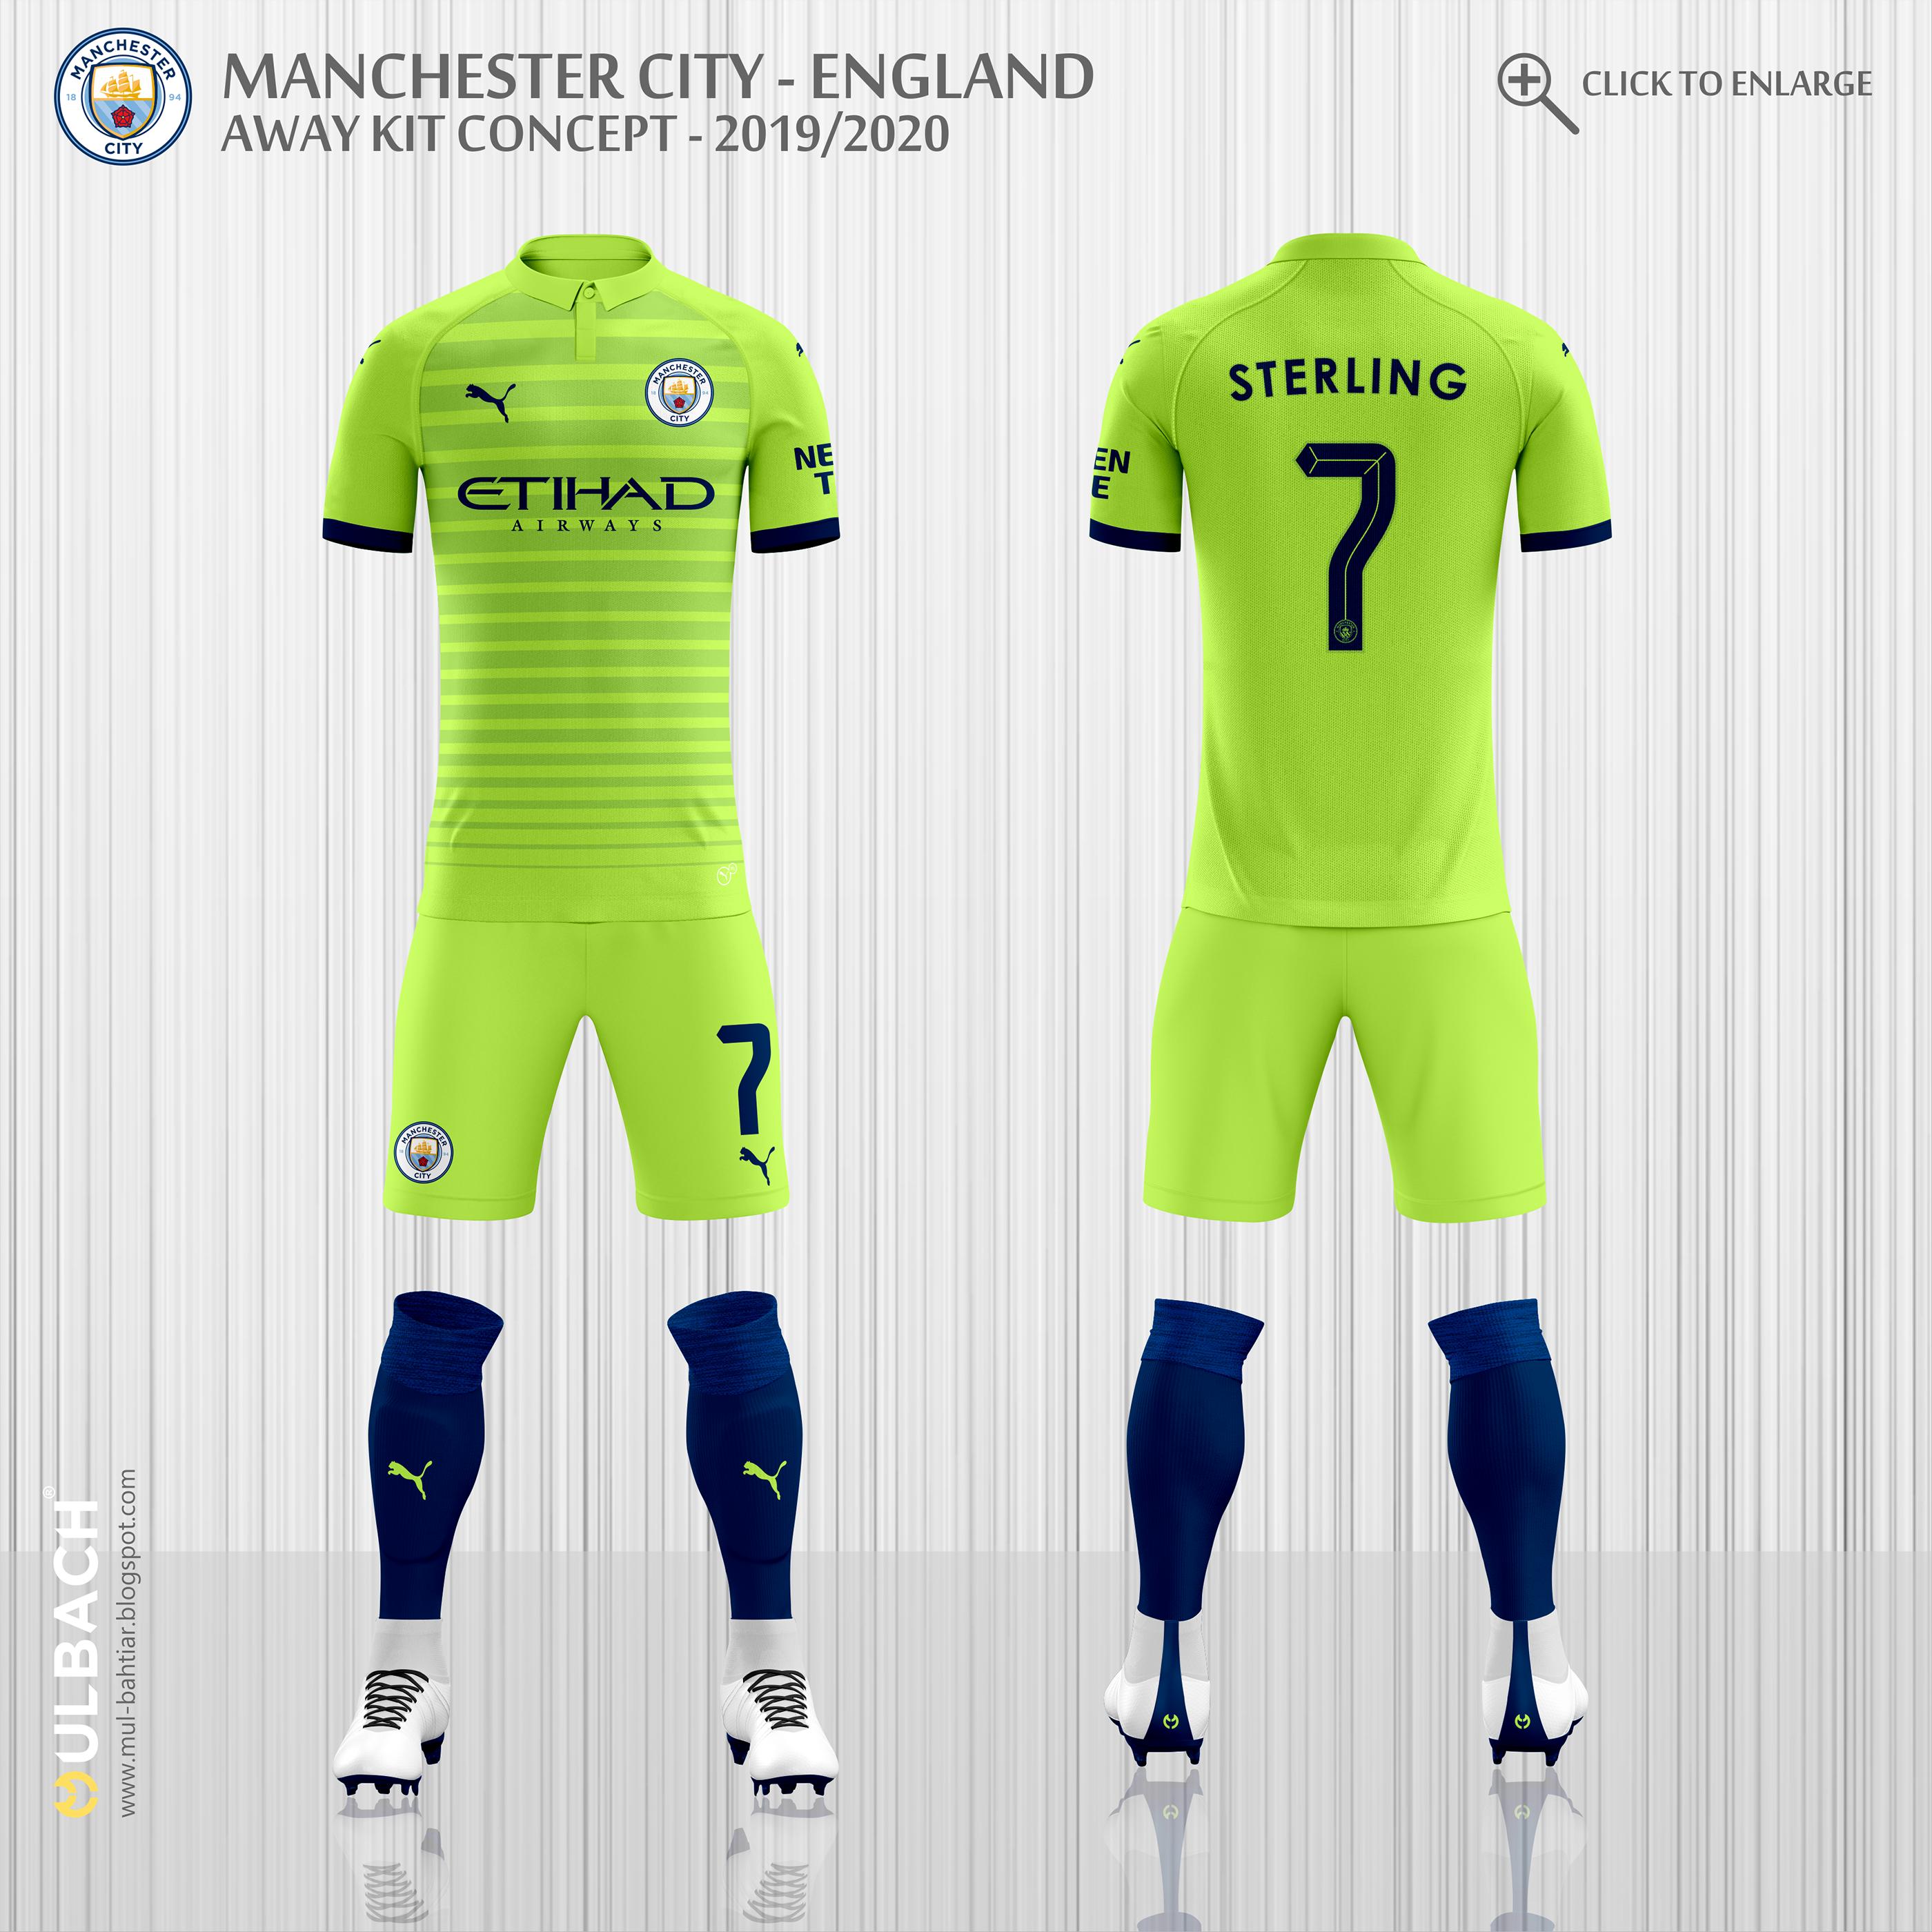 Manchester City 2019/2020 Puma Kits Concept on Behance